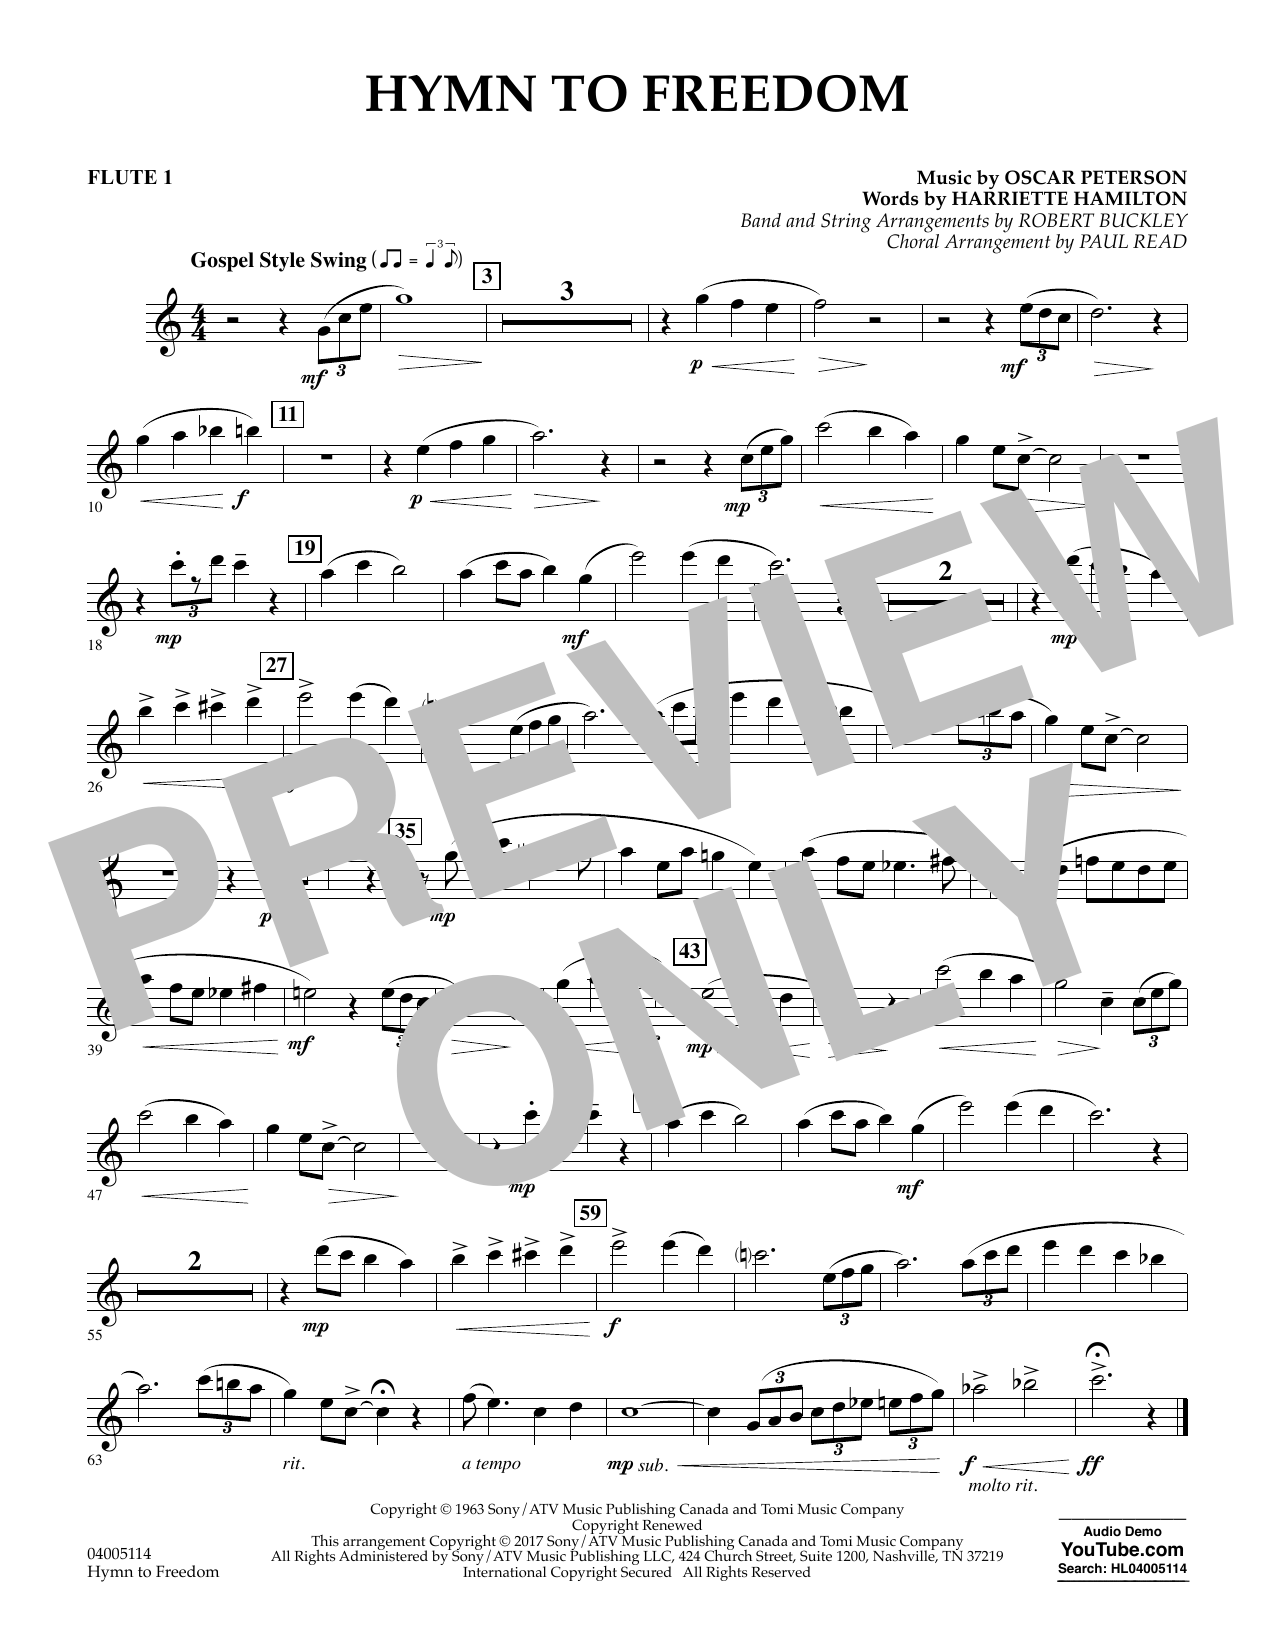 Hymn to Freedom - Flute 1 (Flex-Band)